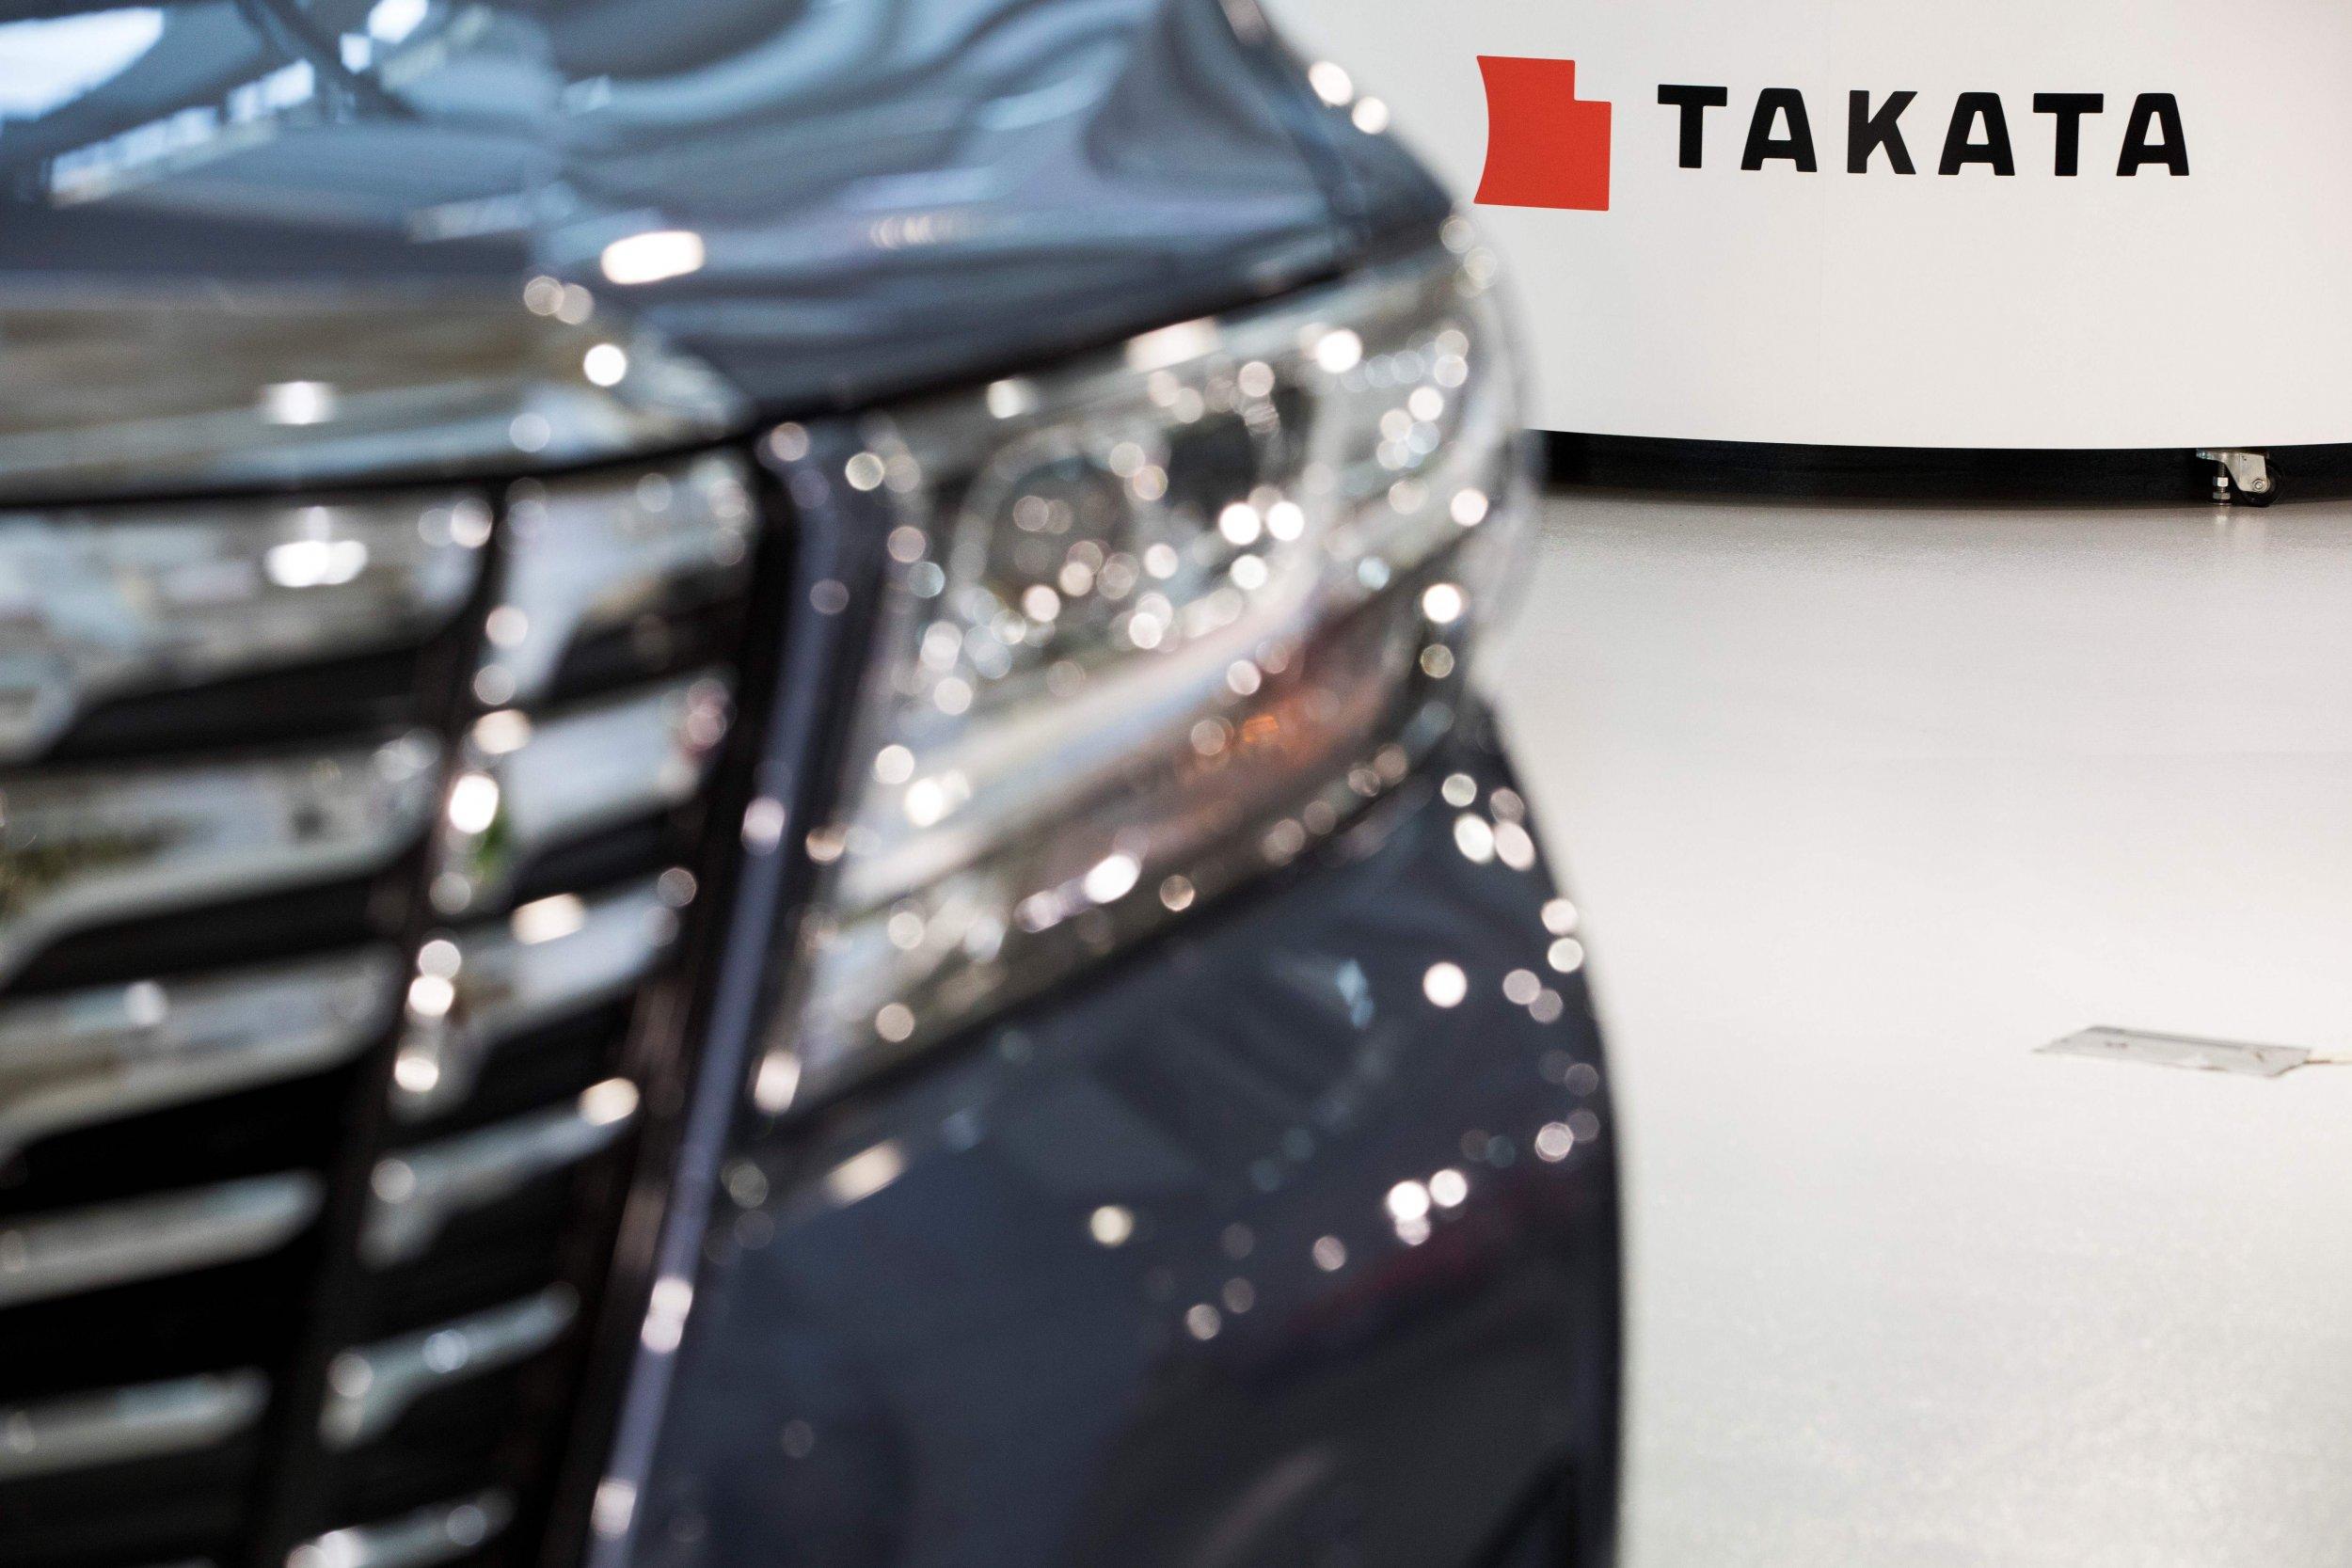 takata car and logo